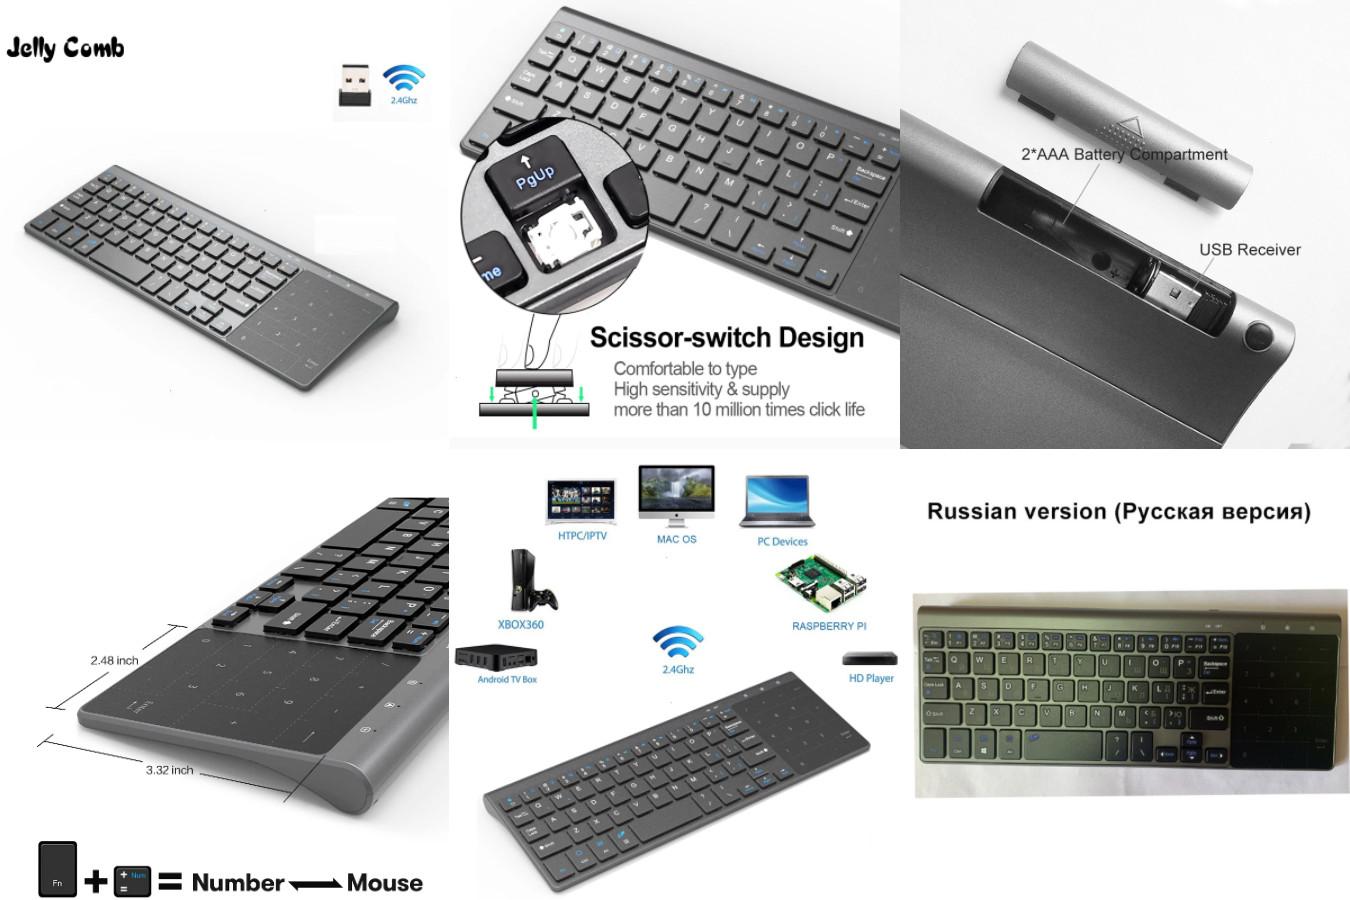 Клавиатура с сенсорной клавиатурой